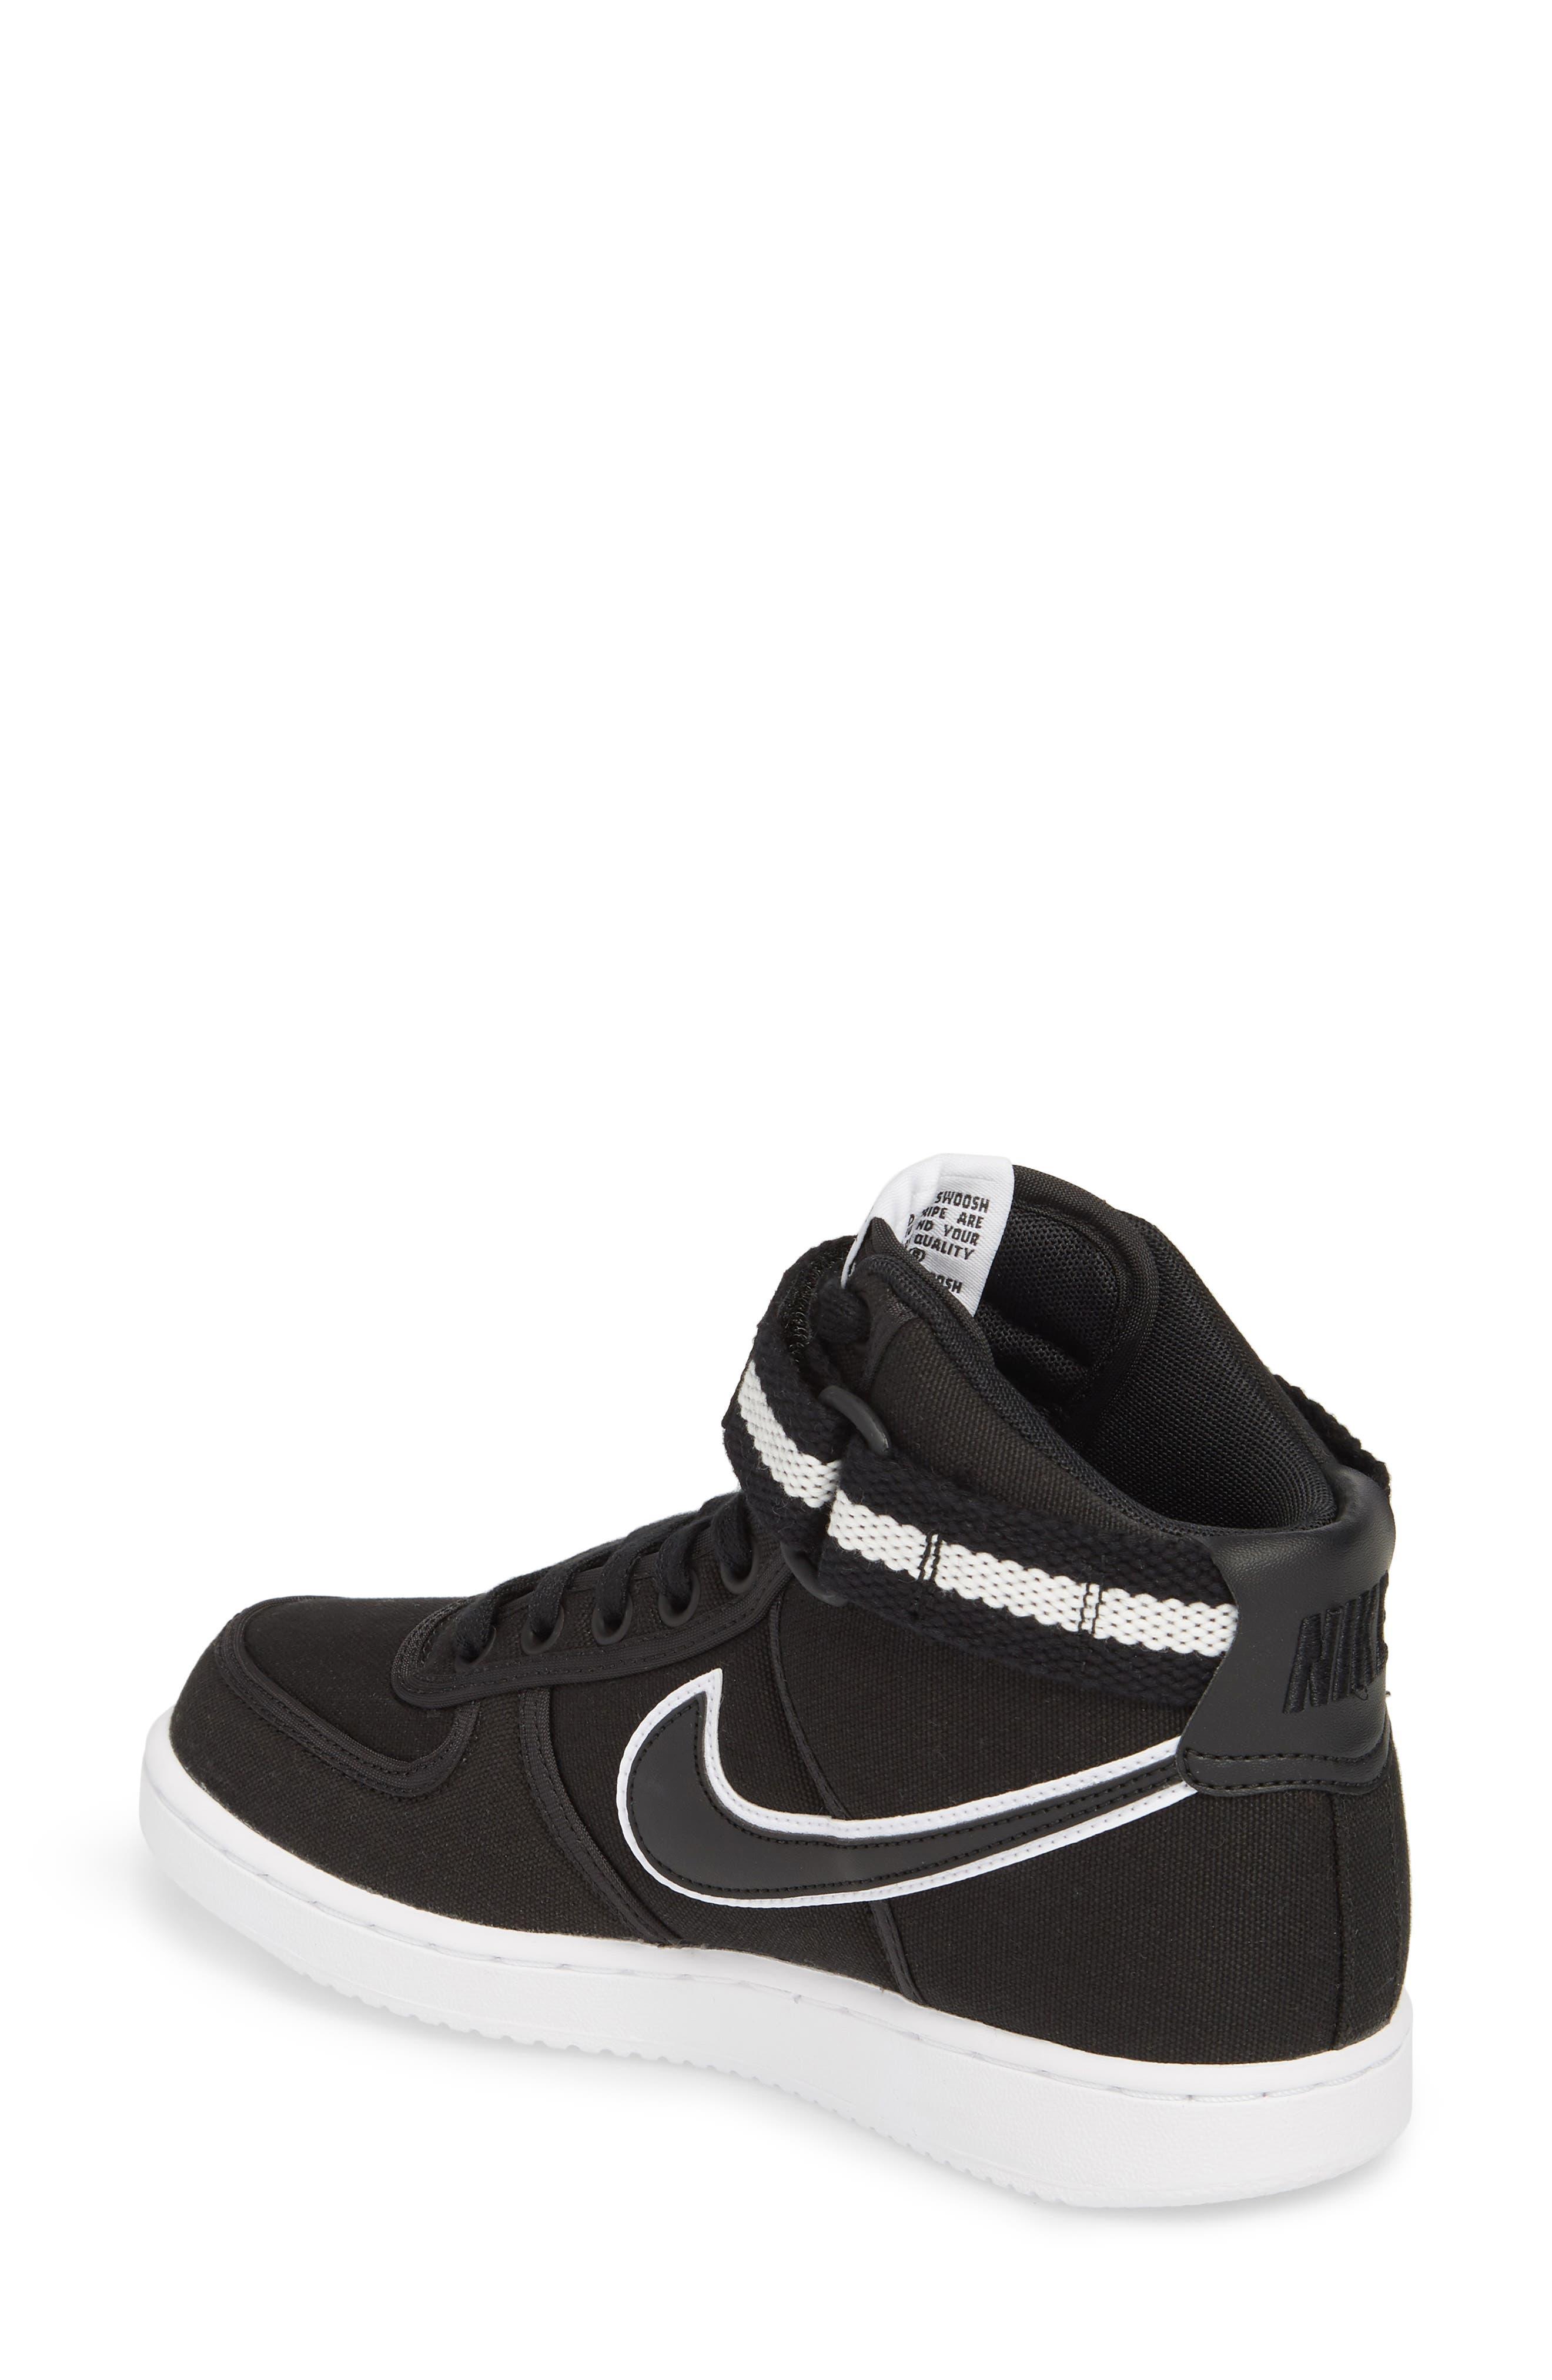 Vandal High Top Sneaker,                             Alternate thumbnail 2, color,                             Black/ Black-White